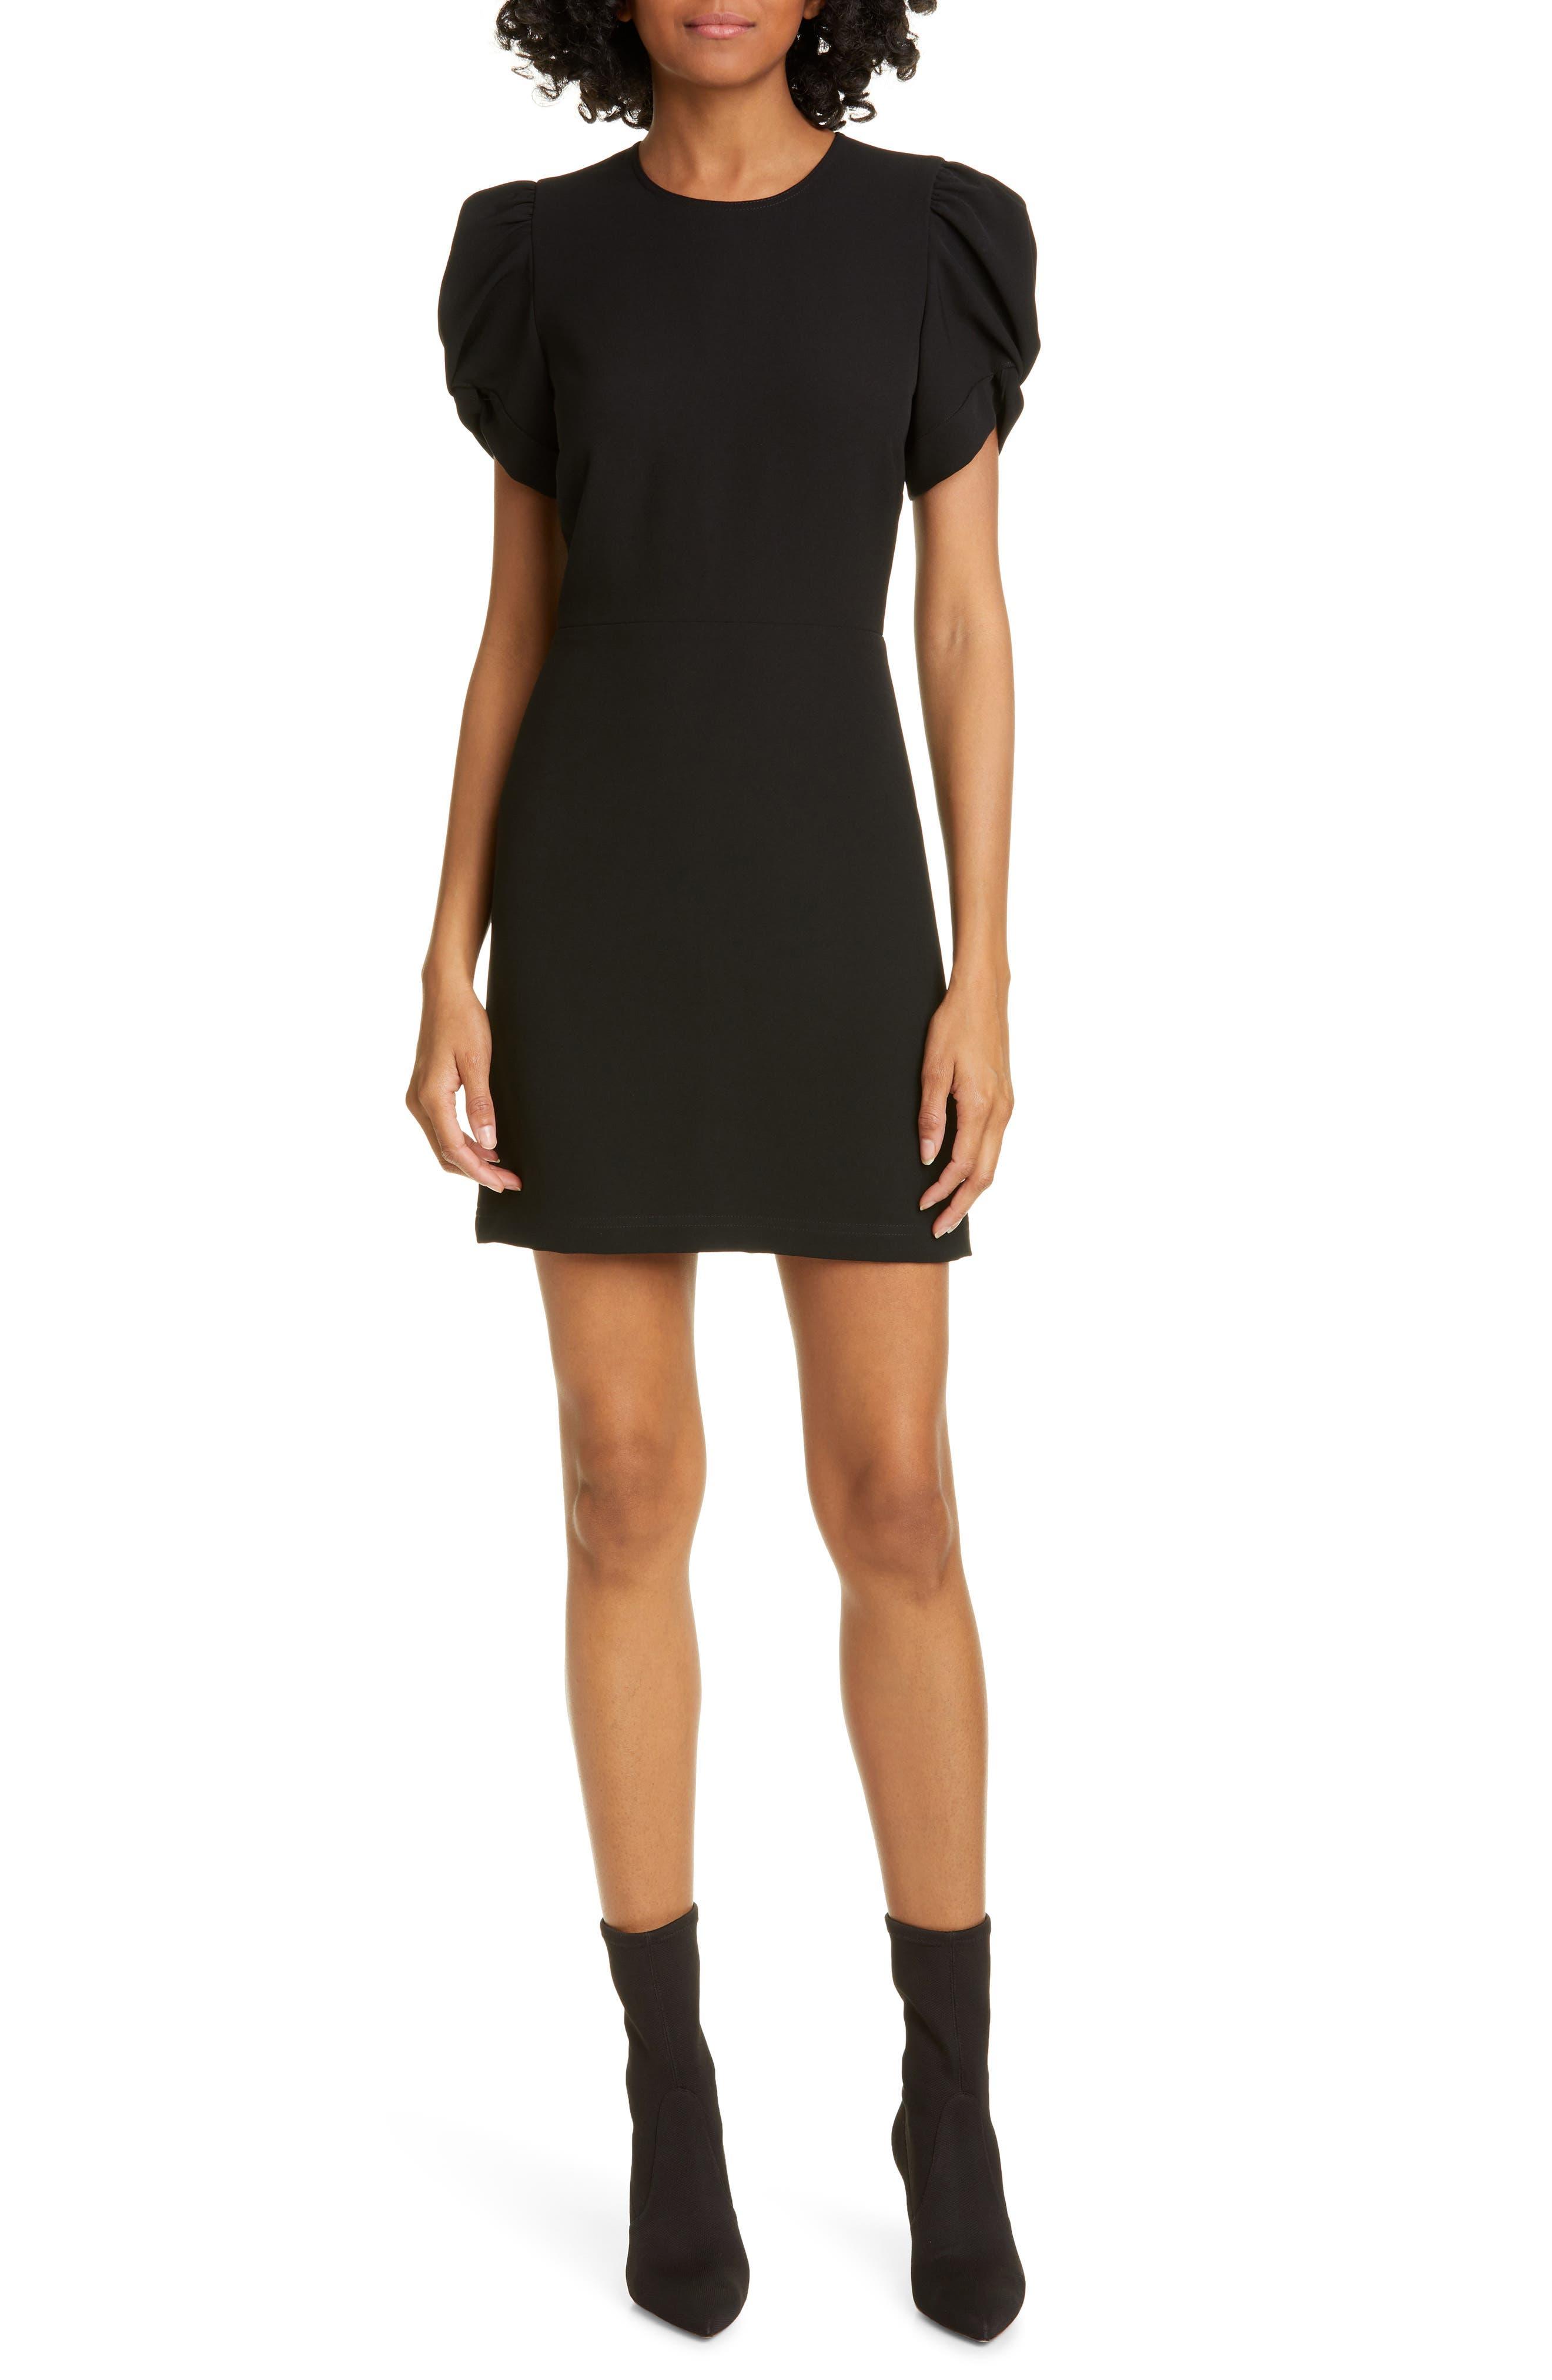 A.l.c. Brinley Puff Sleeve Minidress